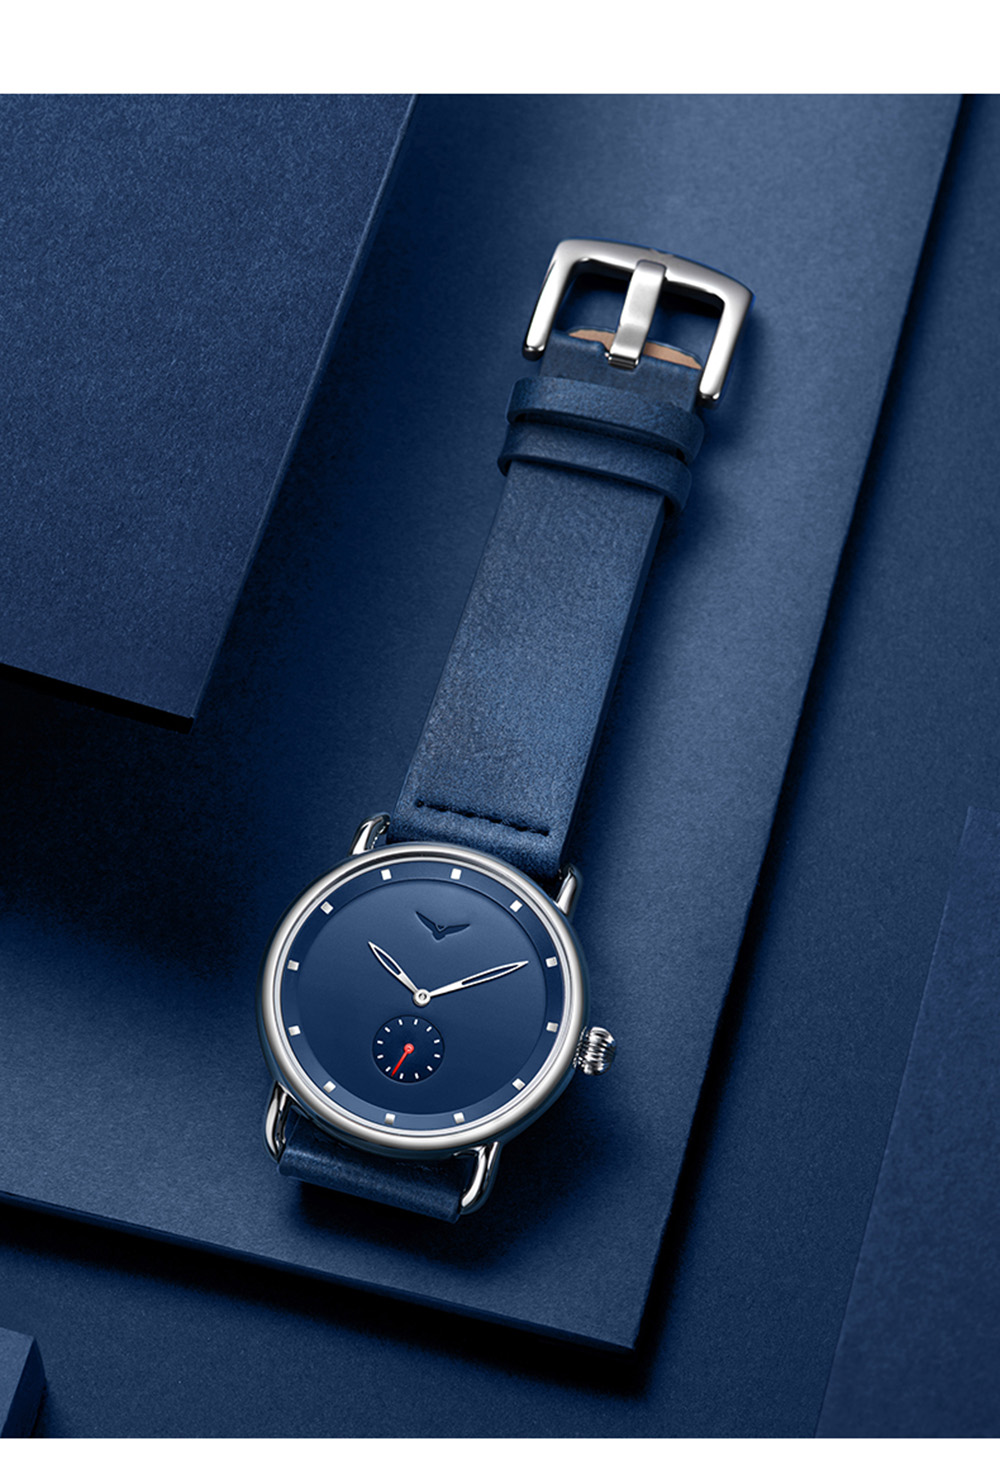 H529f99805c124b40927b7939323025dfK ONOLA top brand leather men watches clock fashion sport simple casual waterproof Wrist watch men relogio masculino